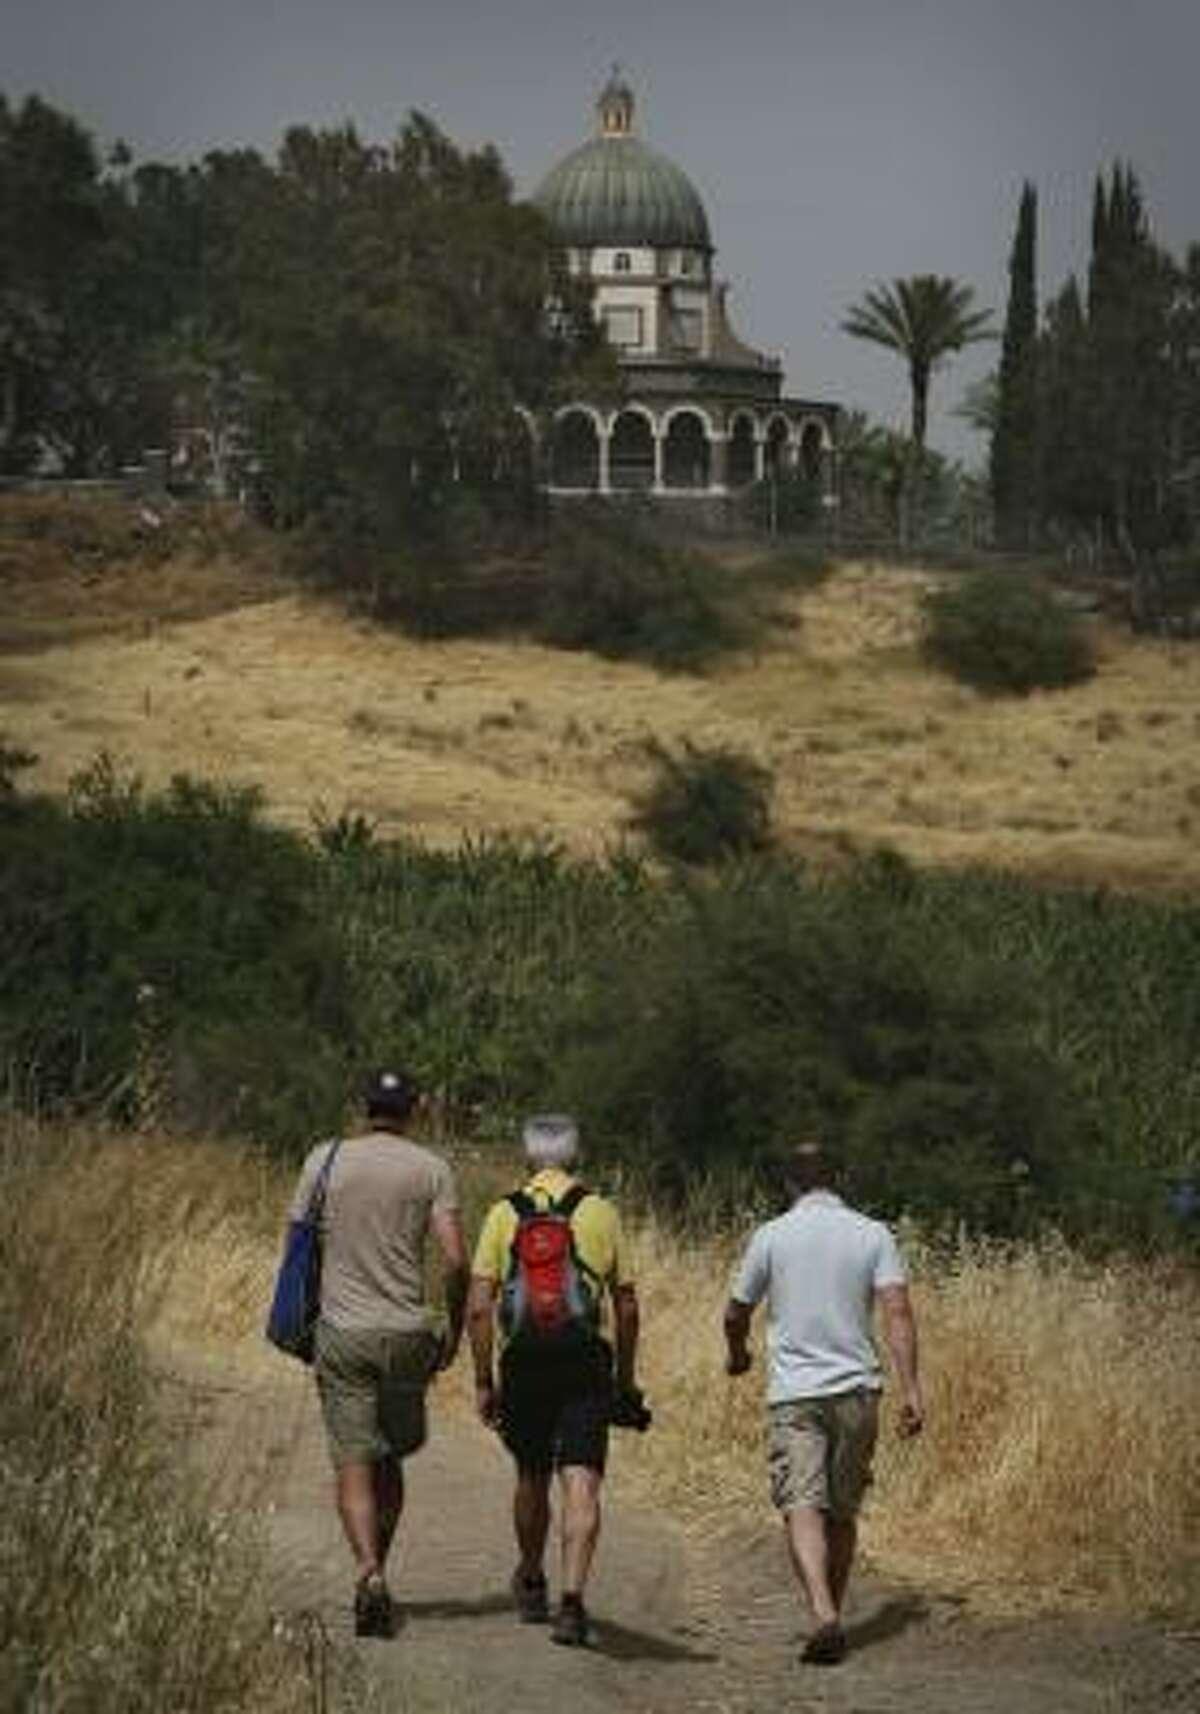 Austrian hikers climb the Jesus Trail toward a church on the Mount of Beatitudes.